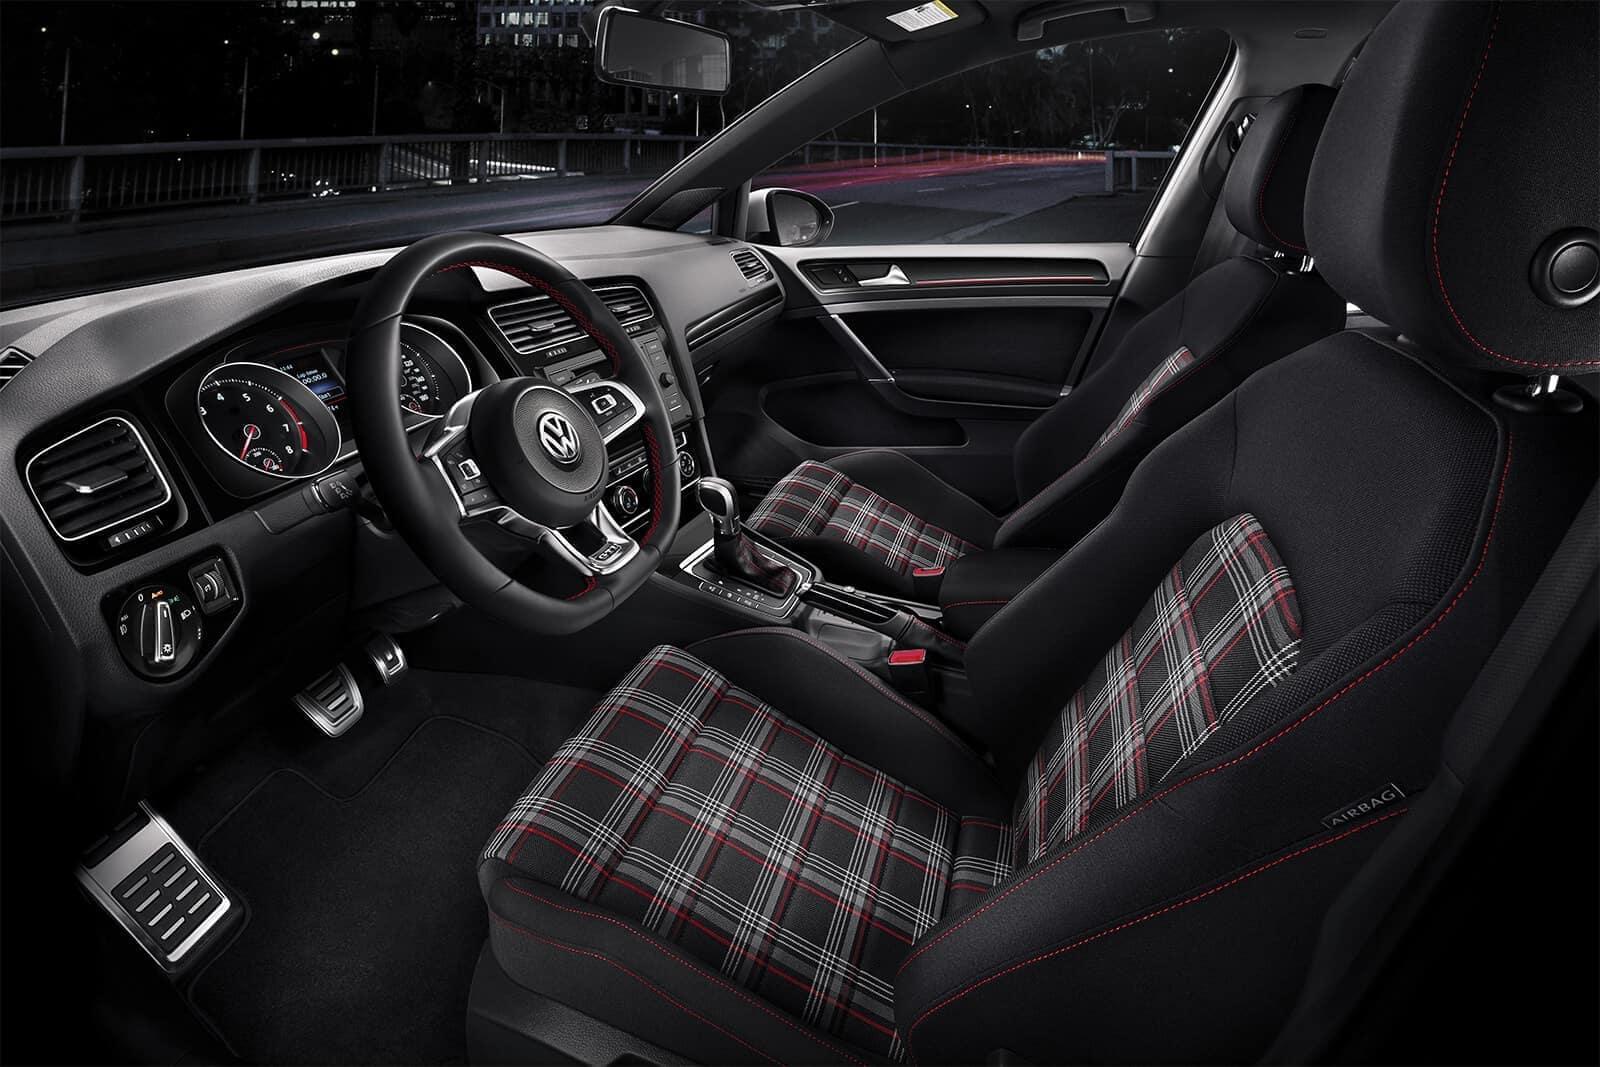 2019 VW Golf GTI Seating